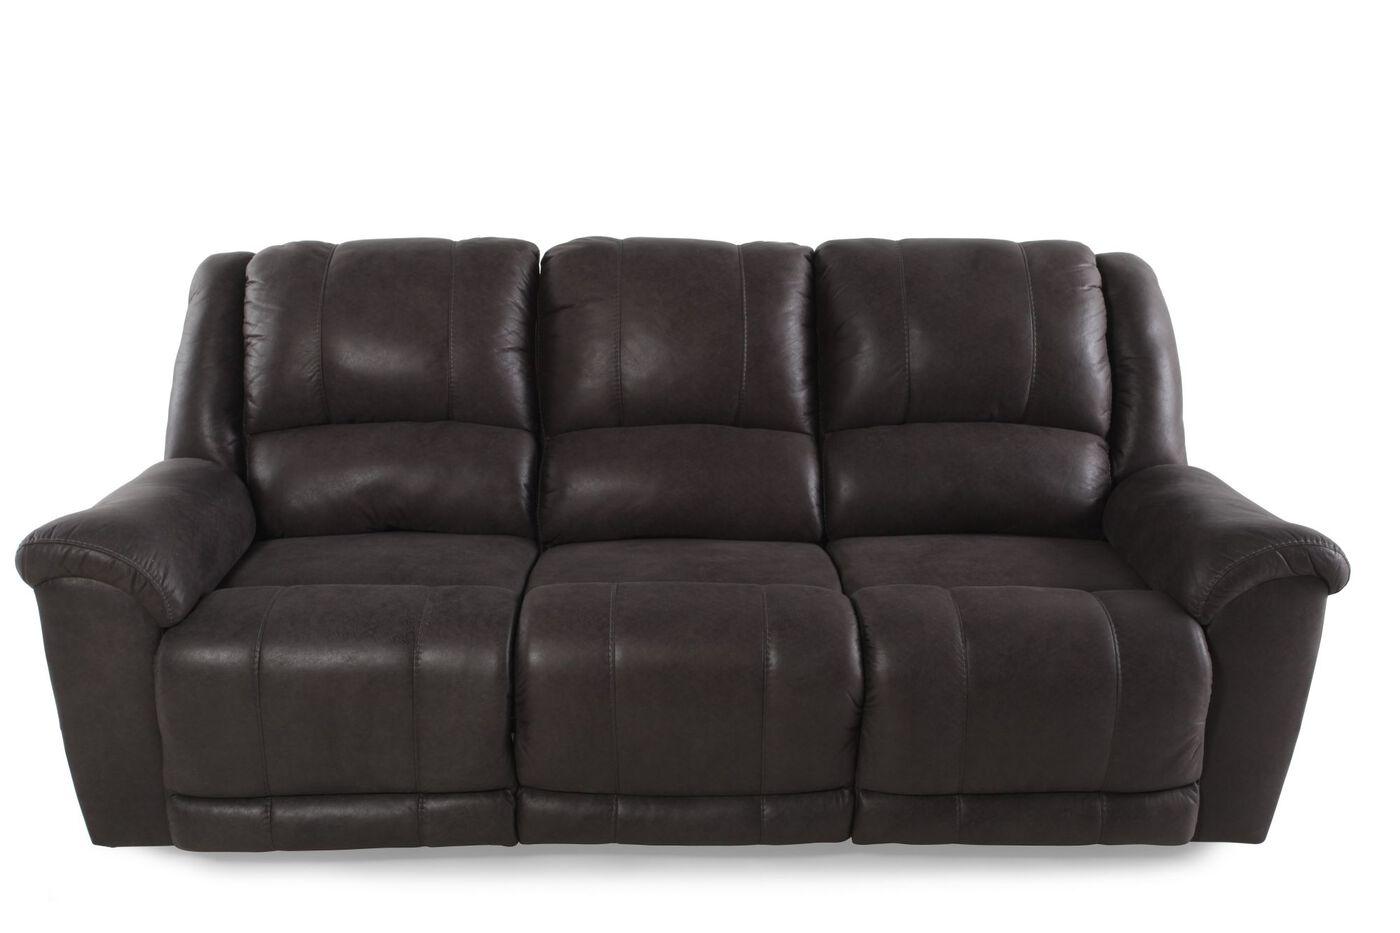 Ashley Niarobi Alloy Reclining Sofa Mathis Brothers Furniture